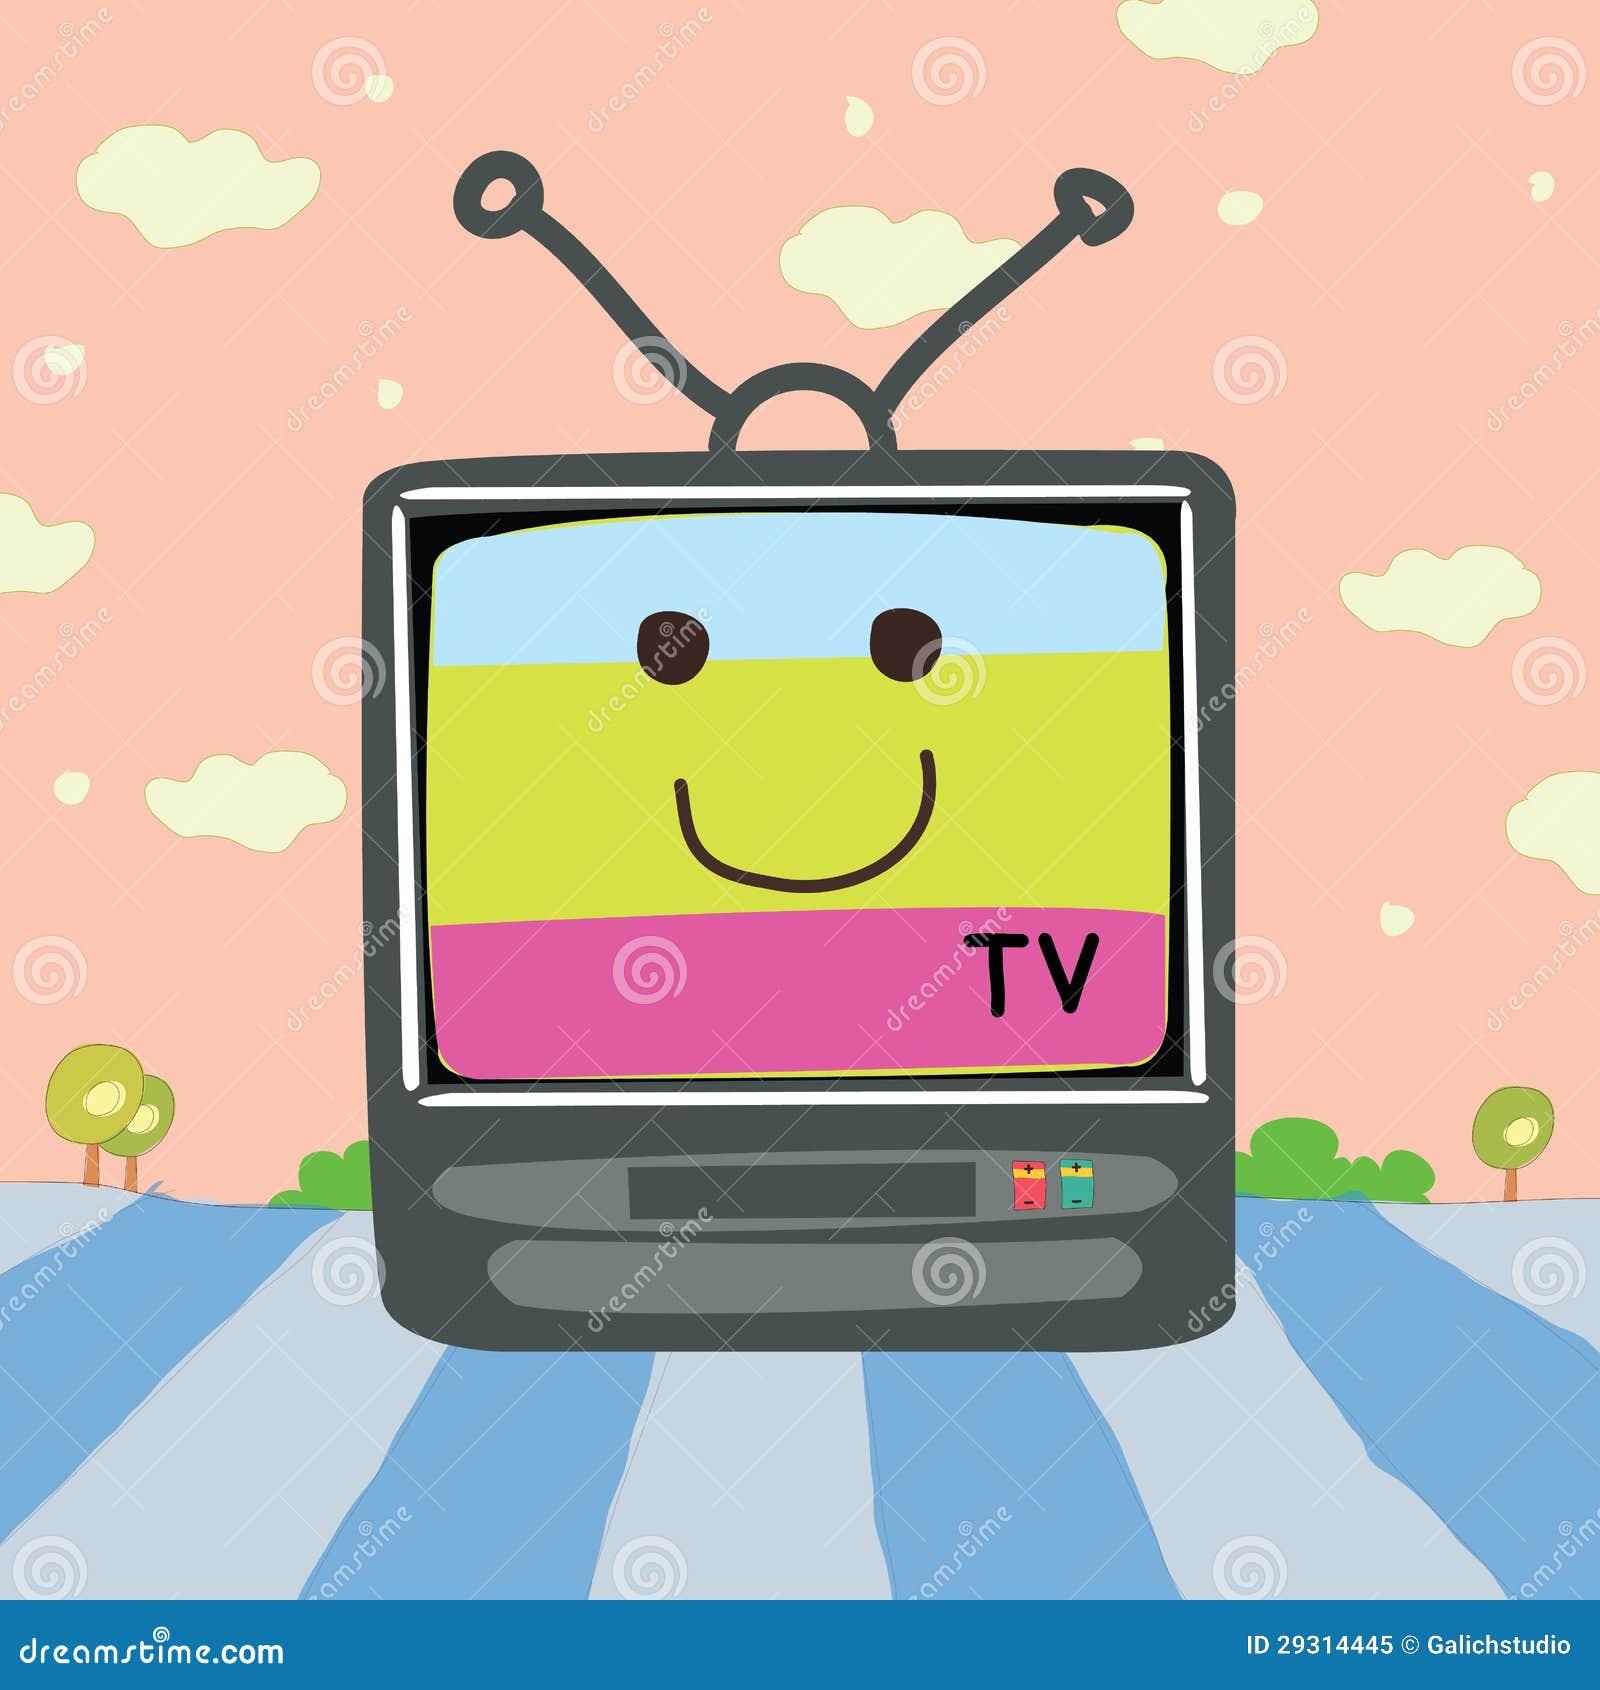 Vector Tv Cartoon Royalty Free Stock Photo - Image: 29314445